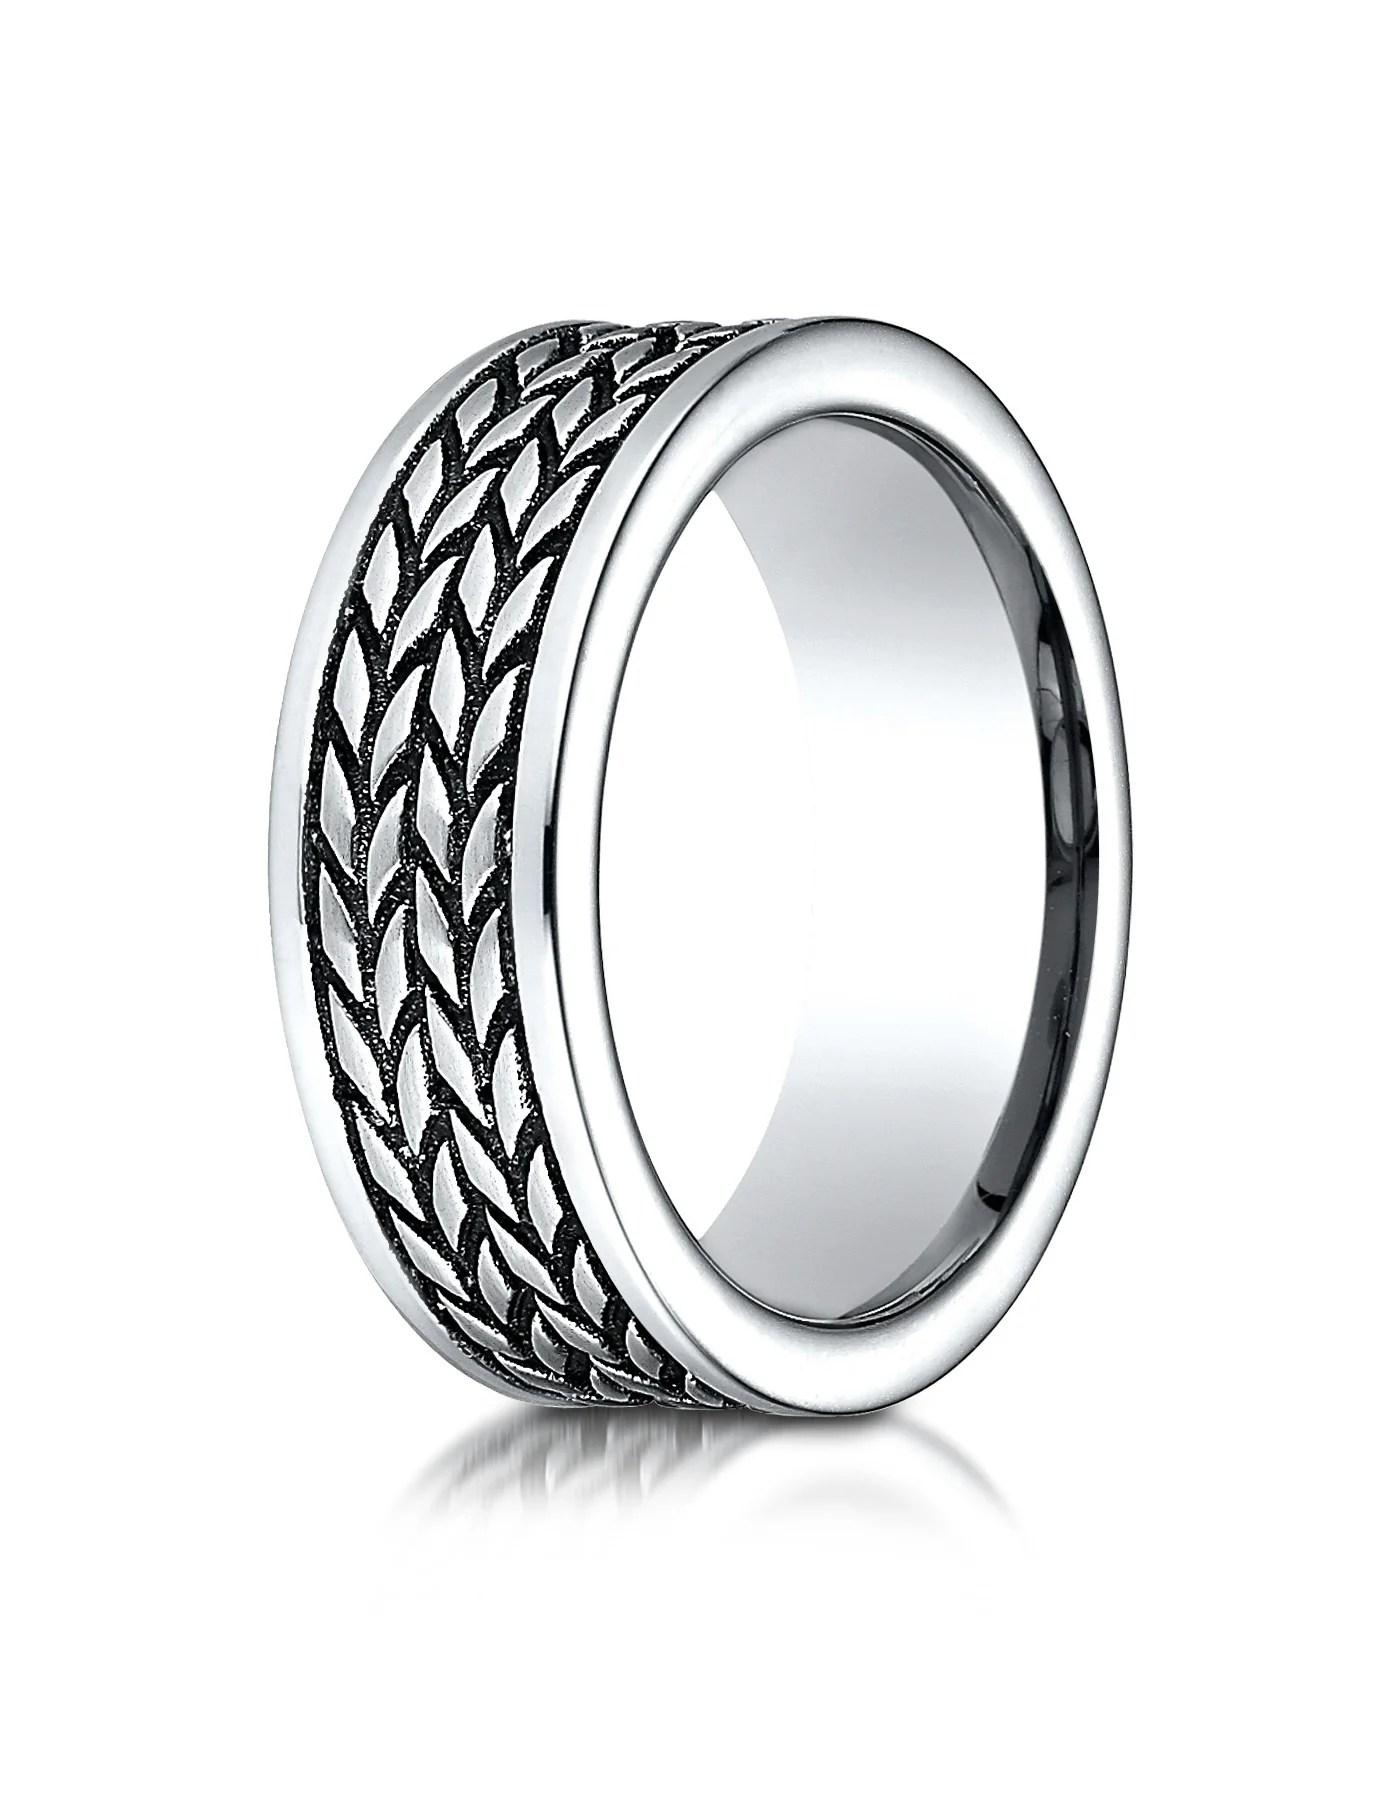 teramo men s cobalt wedding band with tire tread pattern by benchmark cobalt wedding band TERAMO Men s Cobalt Wedding Band with Tire Tread Pattern